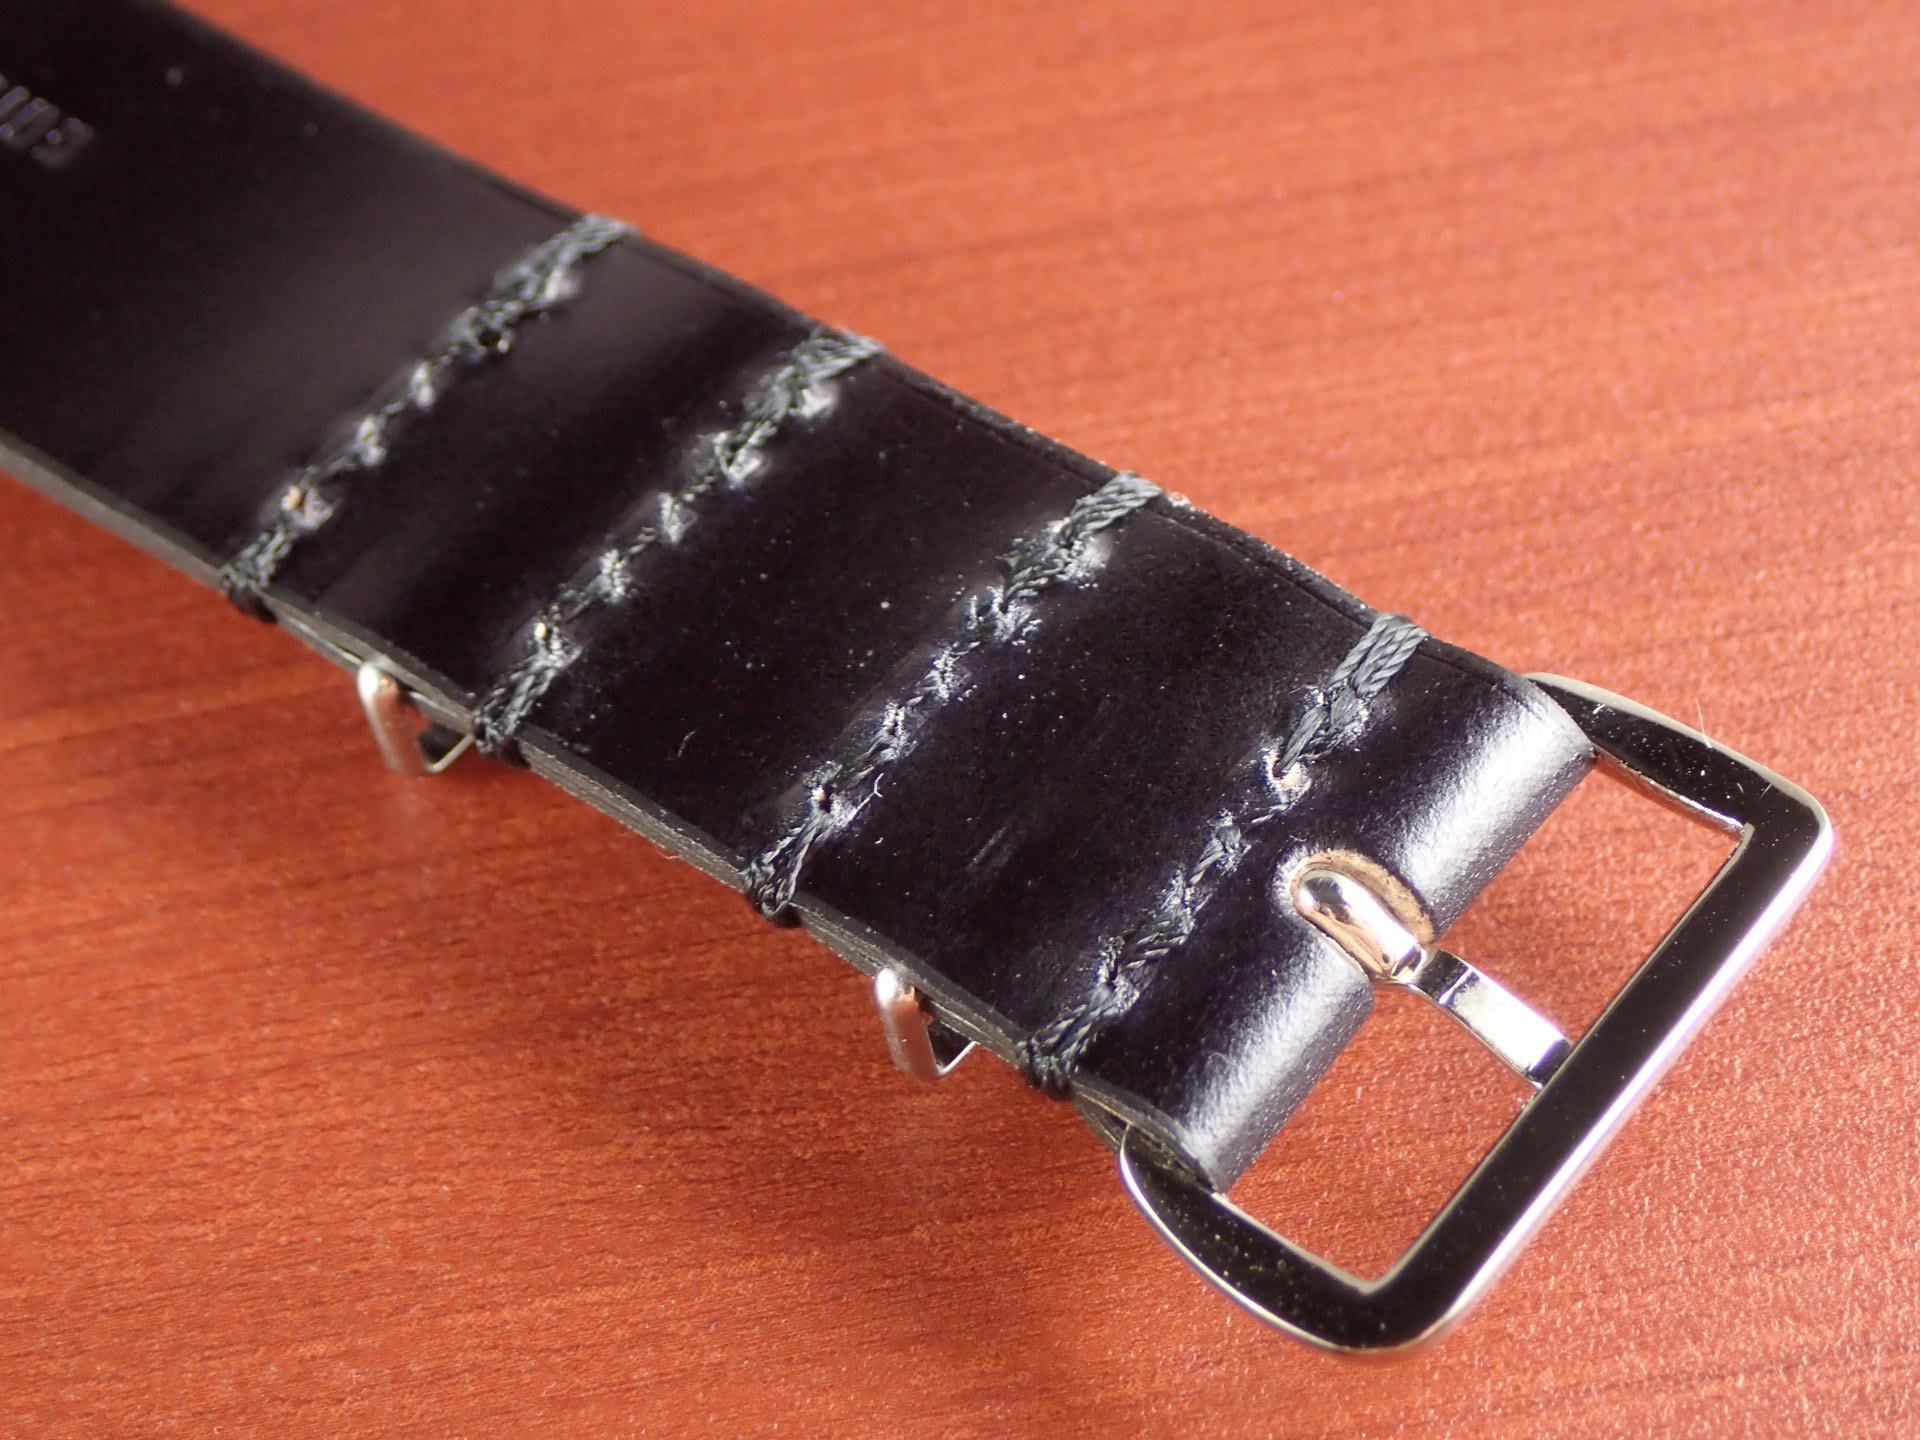 N.ハリウッド×キュリオスキュリオ コラボNATOコードバン革ベルト  ブラックの写真5枚目